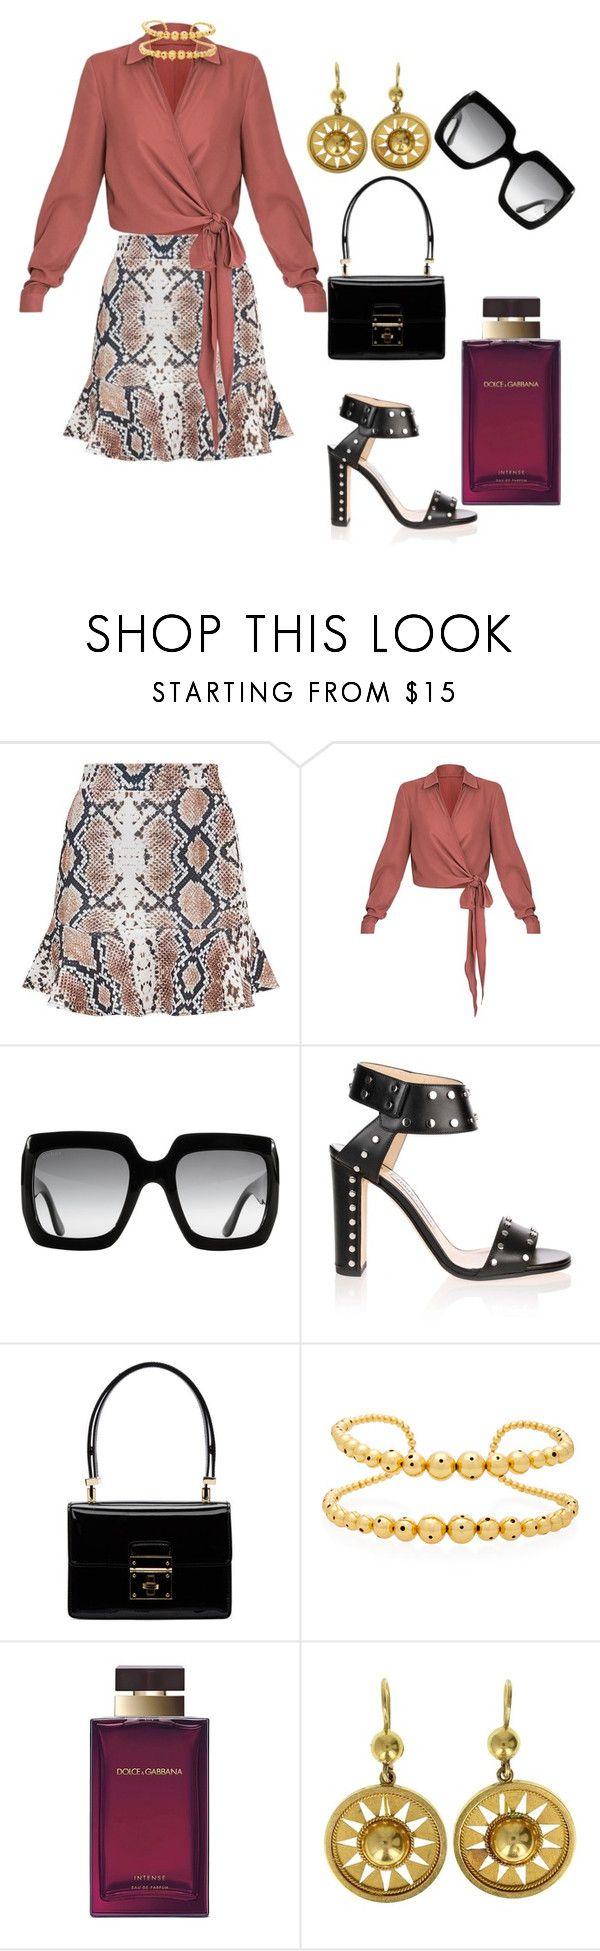 """fall fashions"" by creativegirl247 ❤ liked on Polyvore featuring Gucci, Jimmy Choo, Dolce&Gabbana and Paula Mendoza"